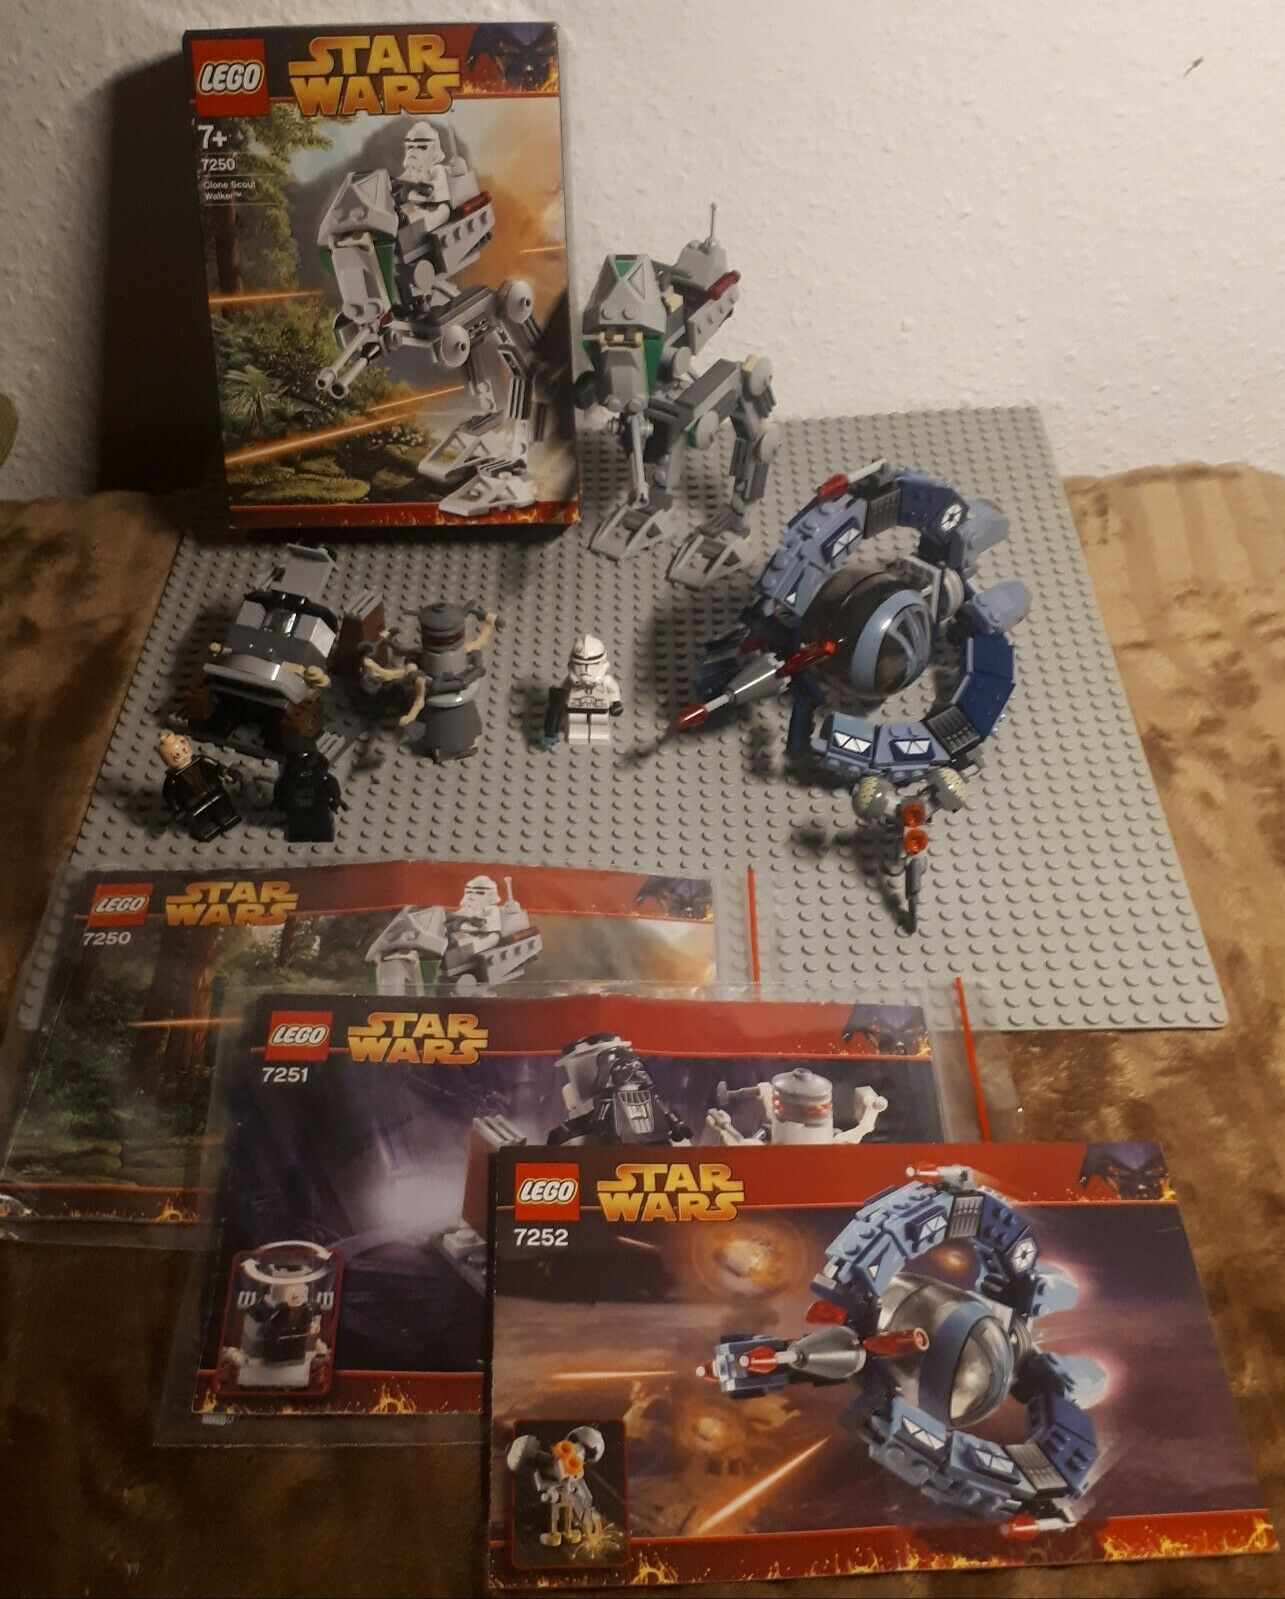 Lego Starwars 7250; 7251 & 7252 2005er Welle